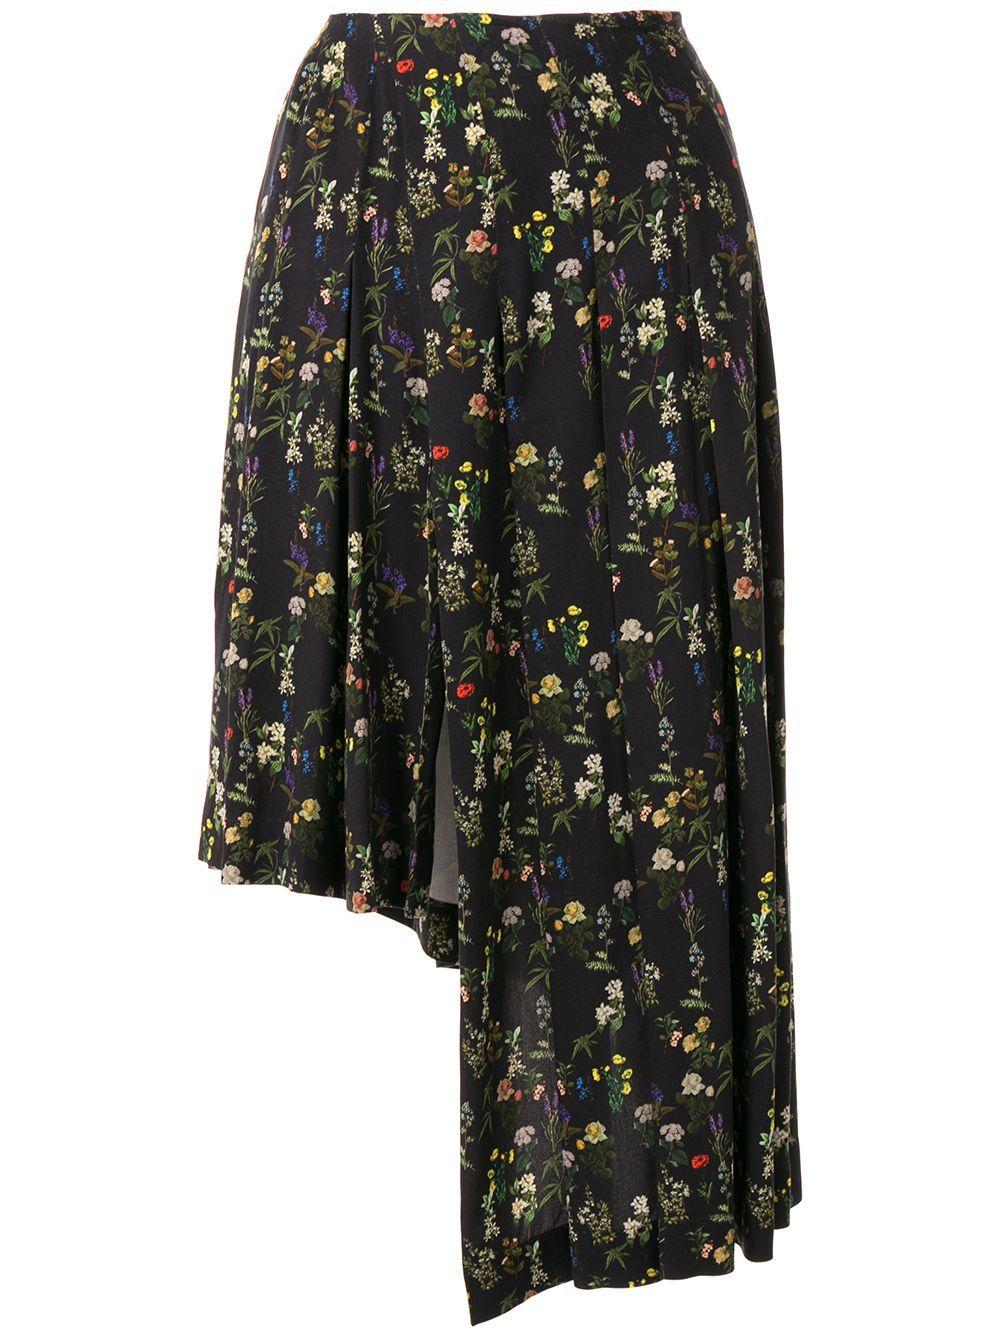 Preen By Thornton Bregazzi юбка асимметричного кроя с цветочным принтом